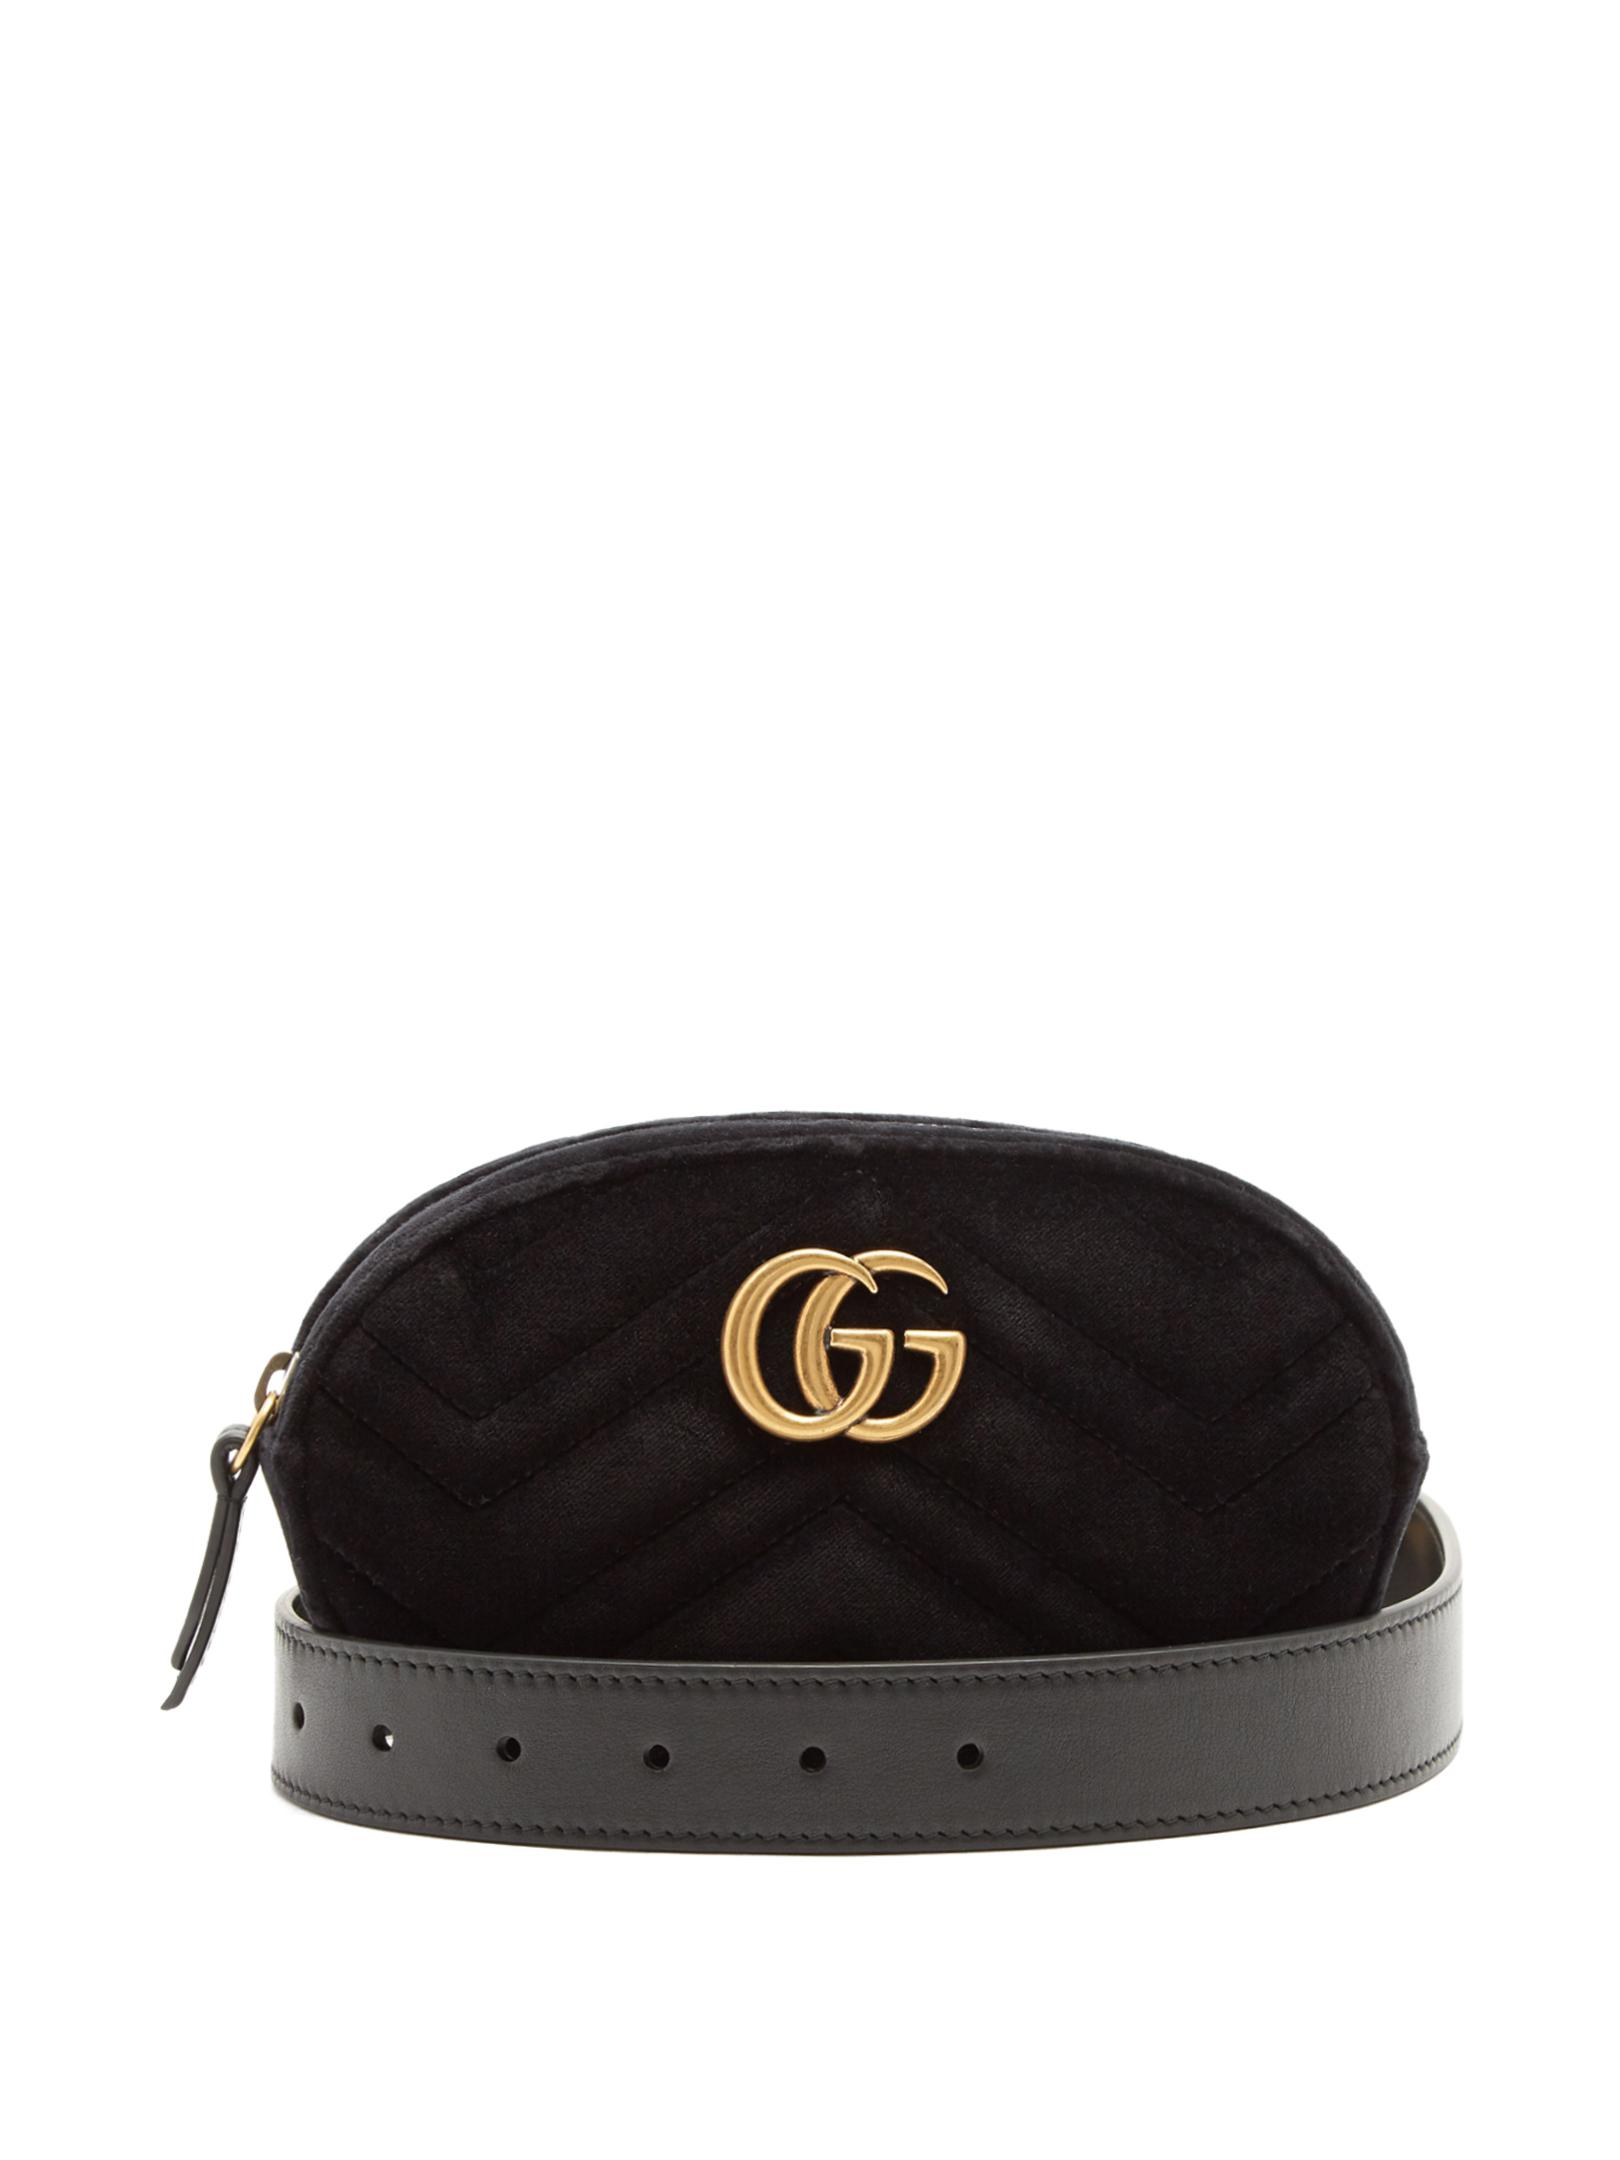 a2bf7f98bf3 Gucci Belt Bag Street Fashion Norris Danta Ford - Homemade Wall ...